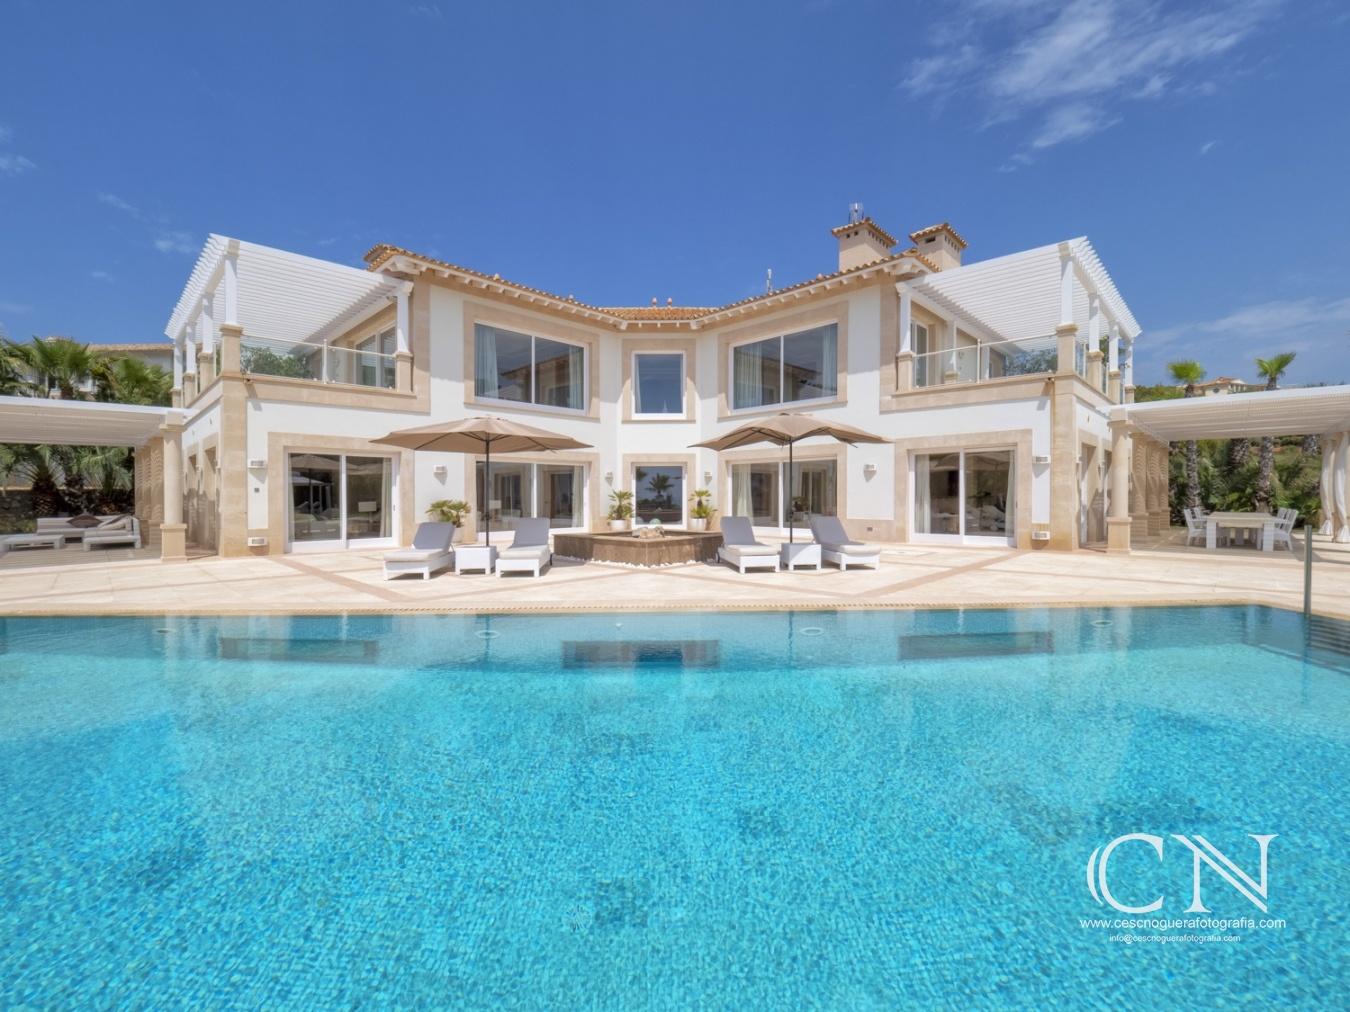 Real Estate  - Cesc Noguera Fotografie, Architectural & Interior design photographer / Landscape Photography